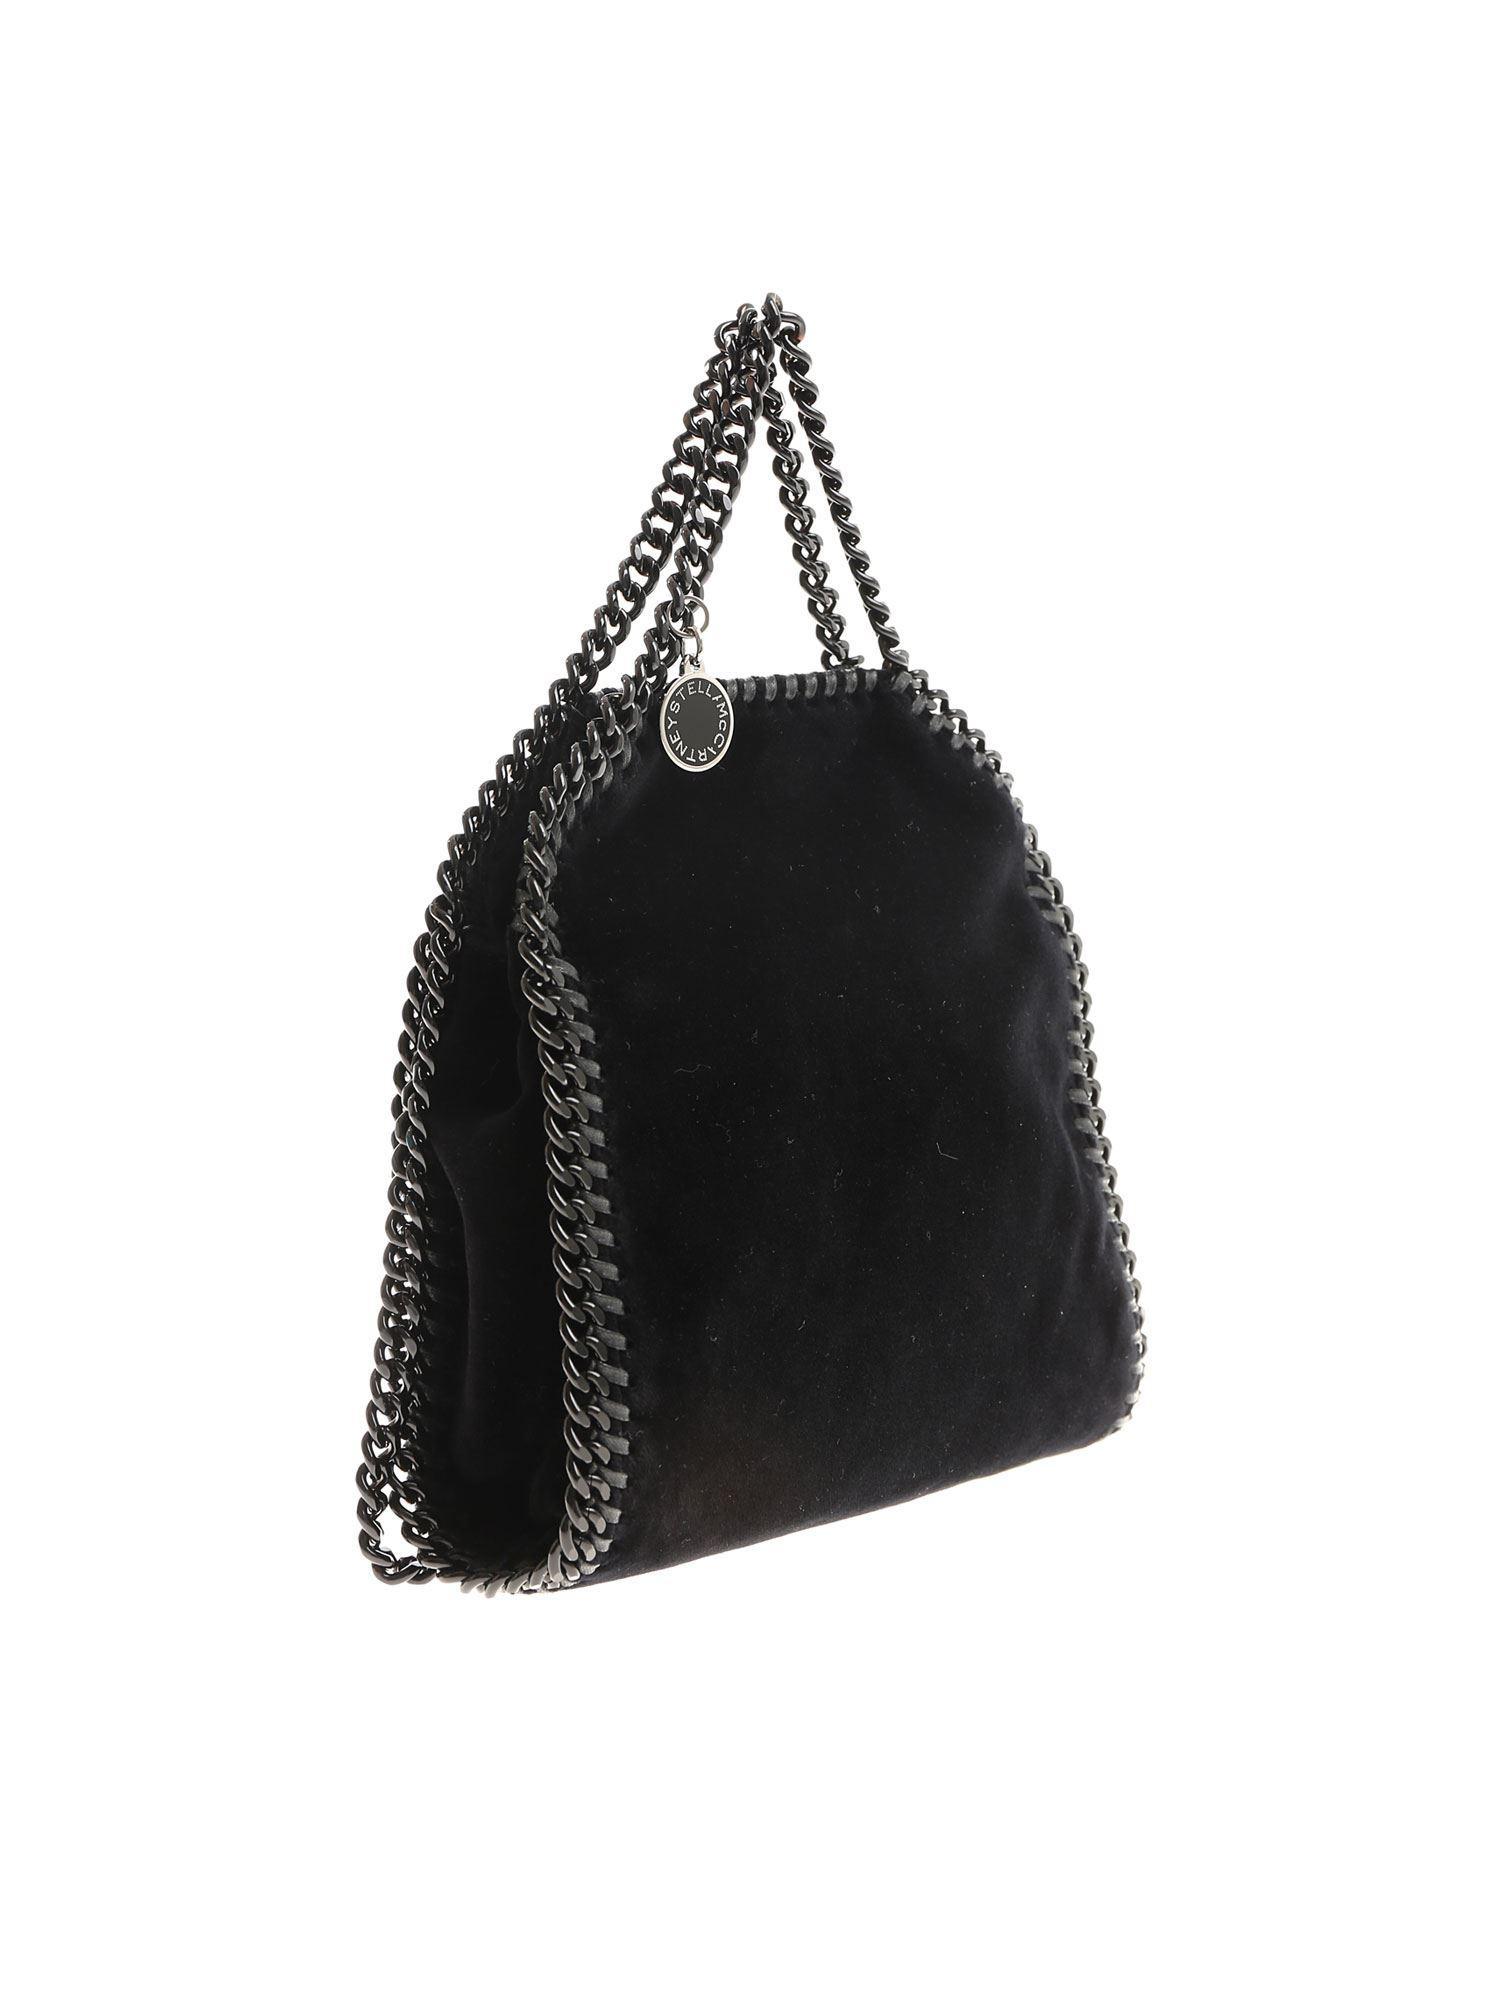 9e1f944b88 Lyst - Stella McCartney Black Falabella Tiny Velvet Bag in Black